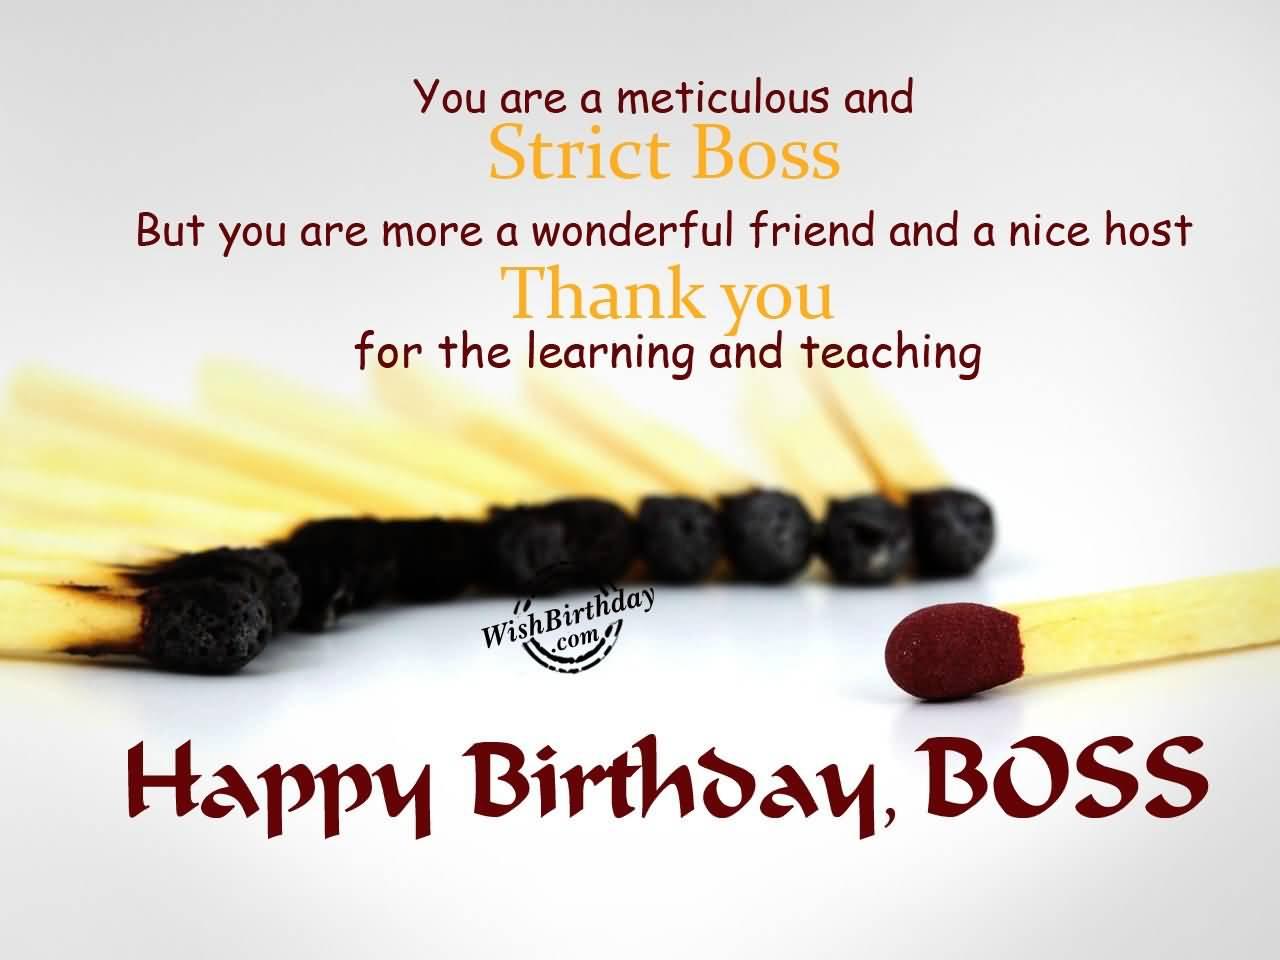 Happy Birthday Quotes Boss ~ Wonderful boss birthday wishes sayings picture photo picsmine